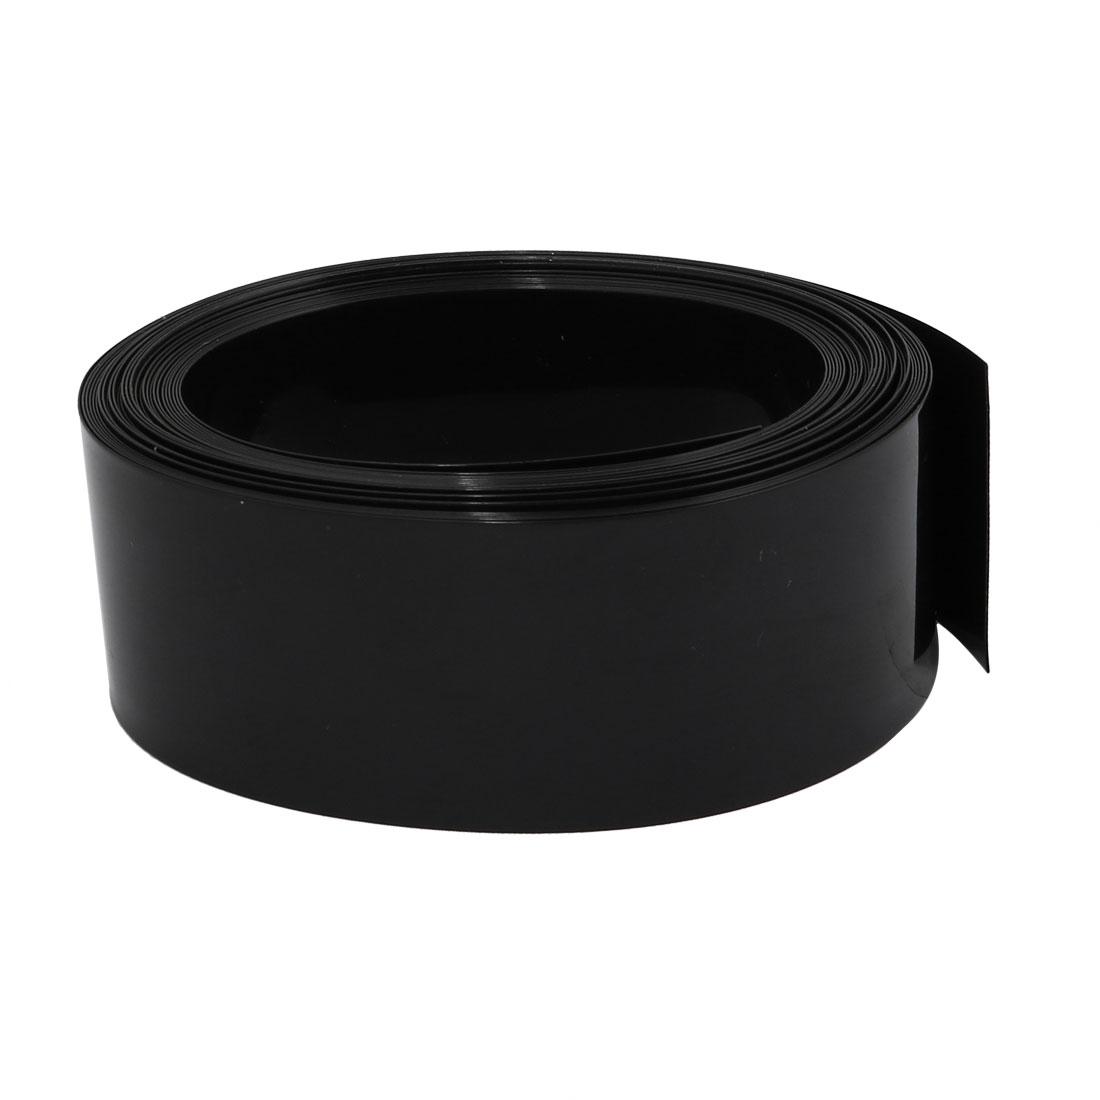 31mm Flat Width 6M Length PVC Heat Shrinkable Tube Black for Capacitive Battery